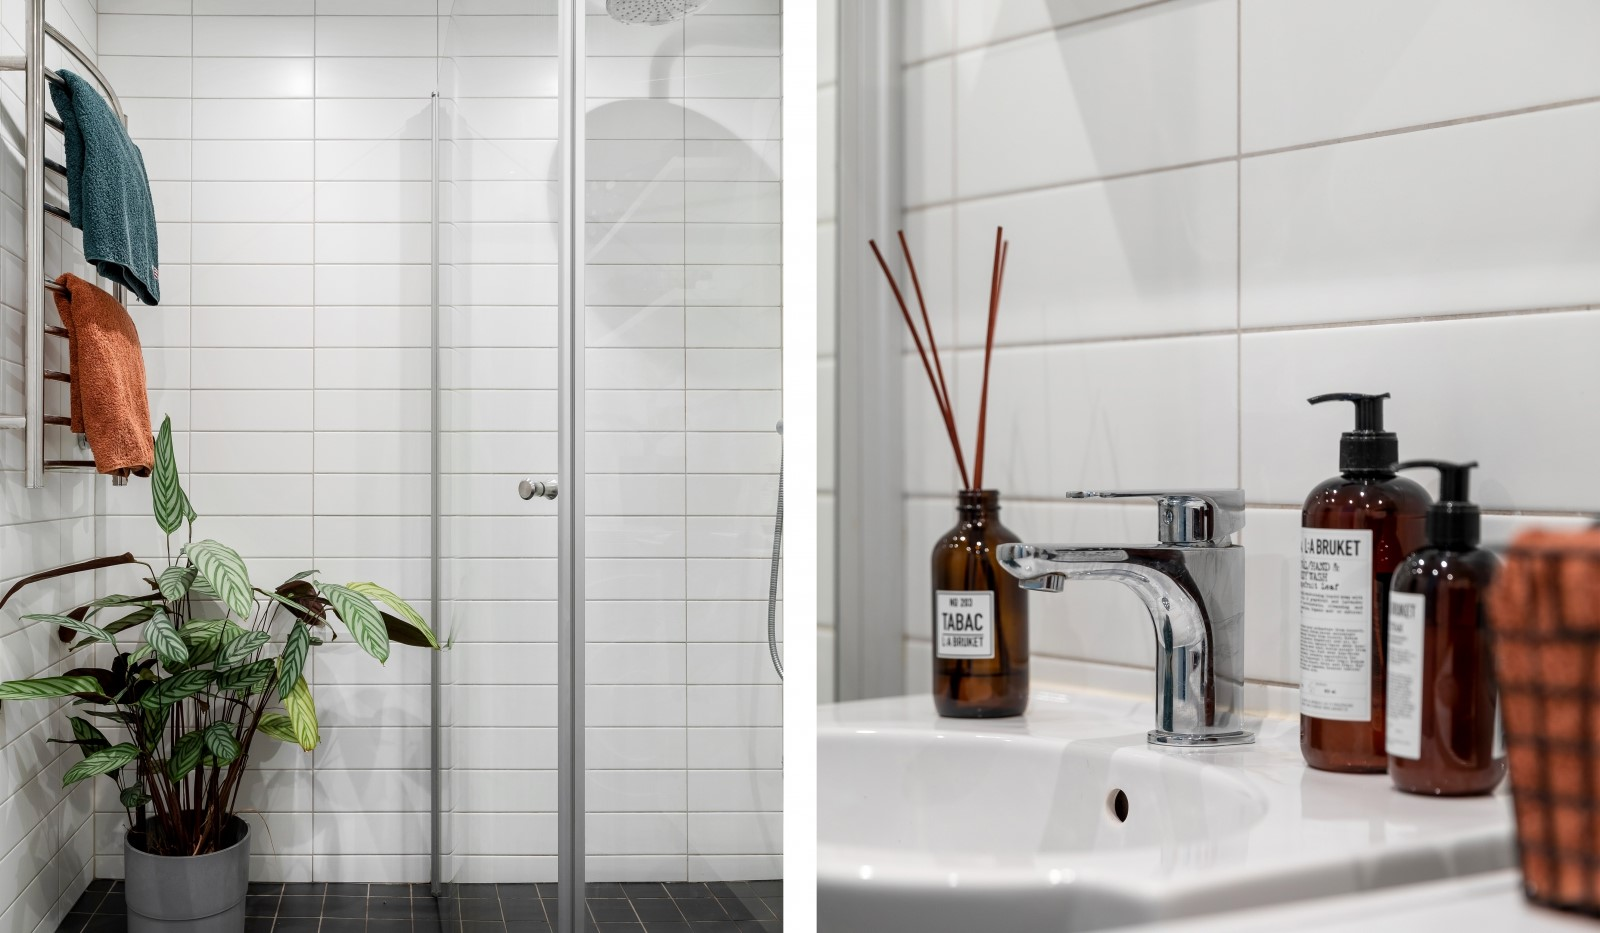 Kocksgatan 42 - Fräscht badrum detalj